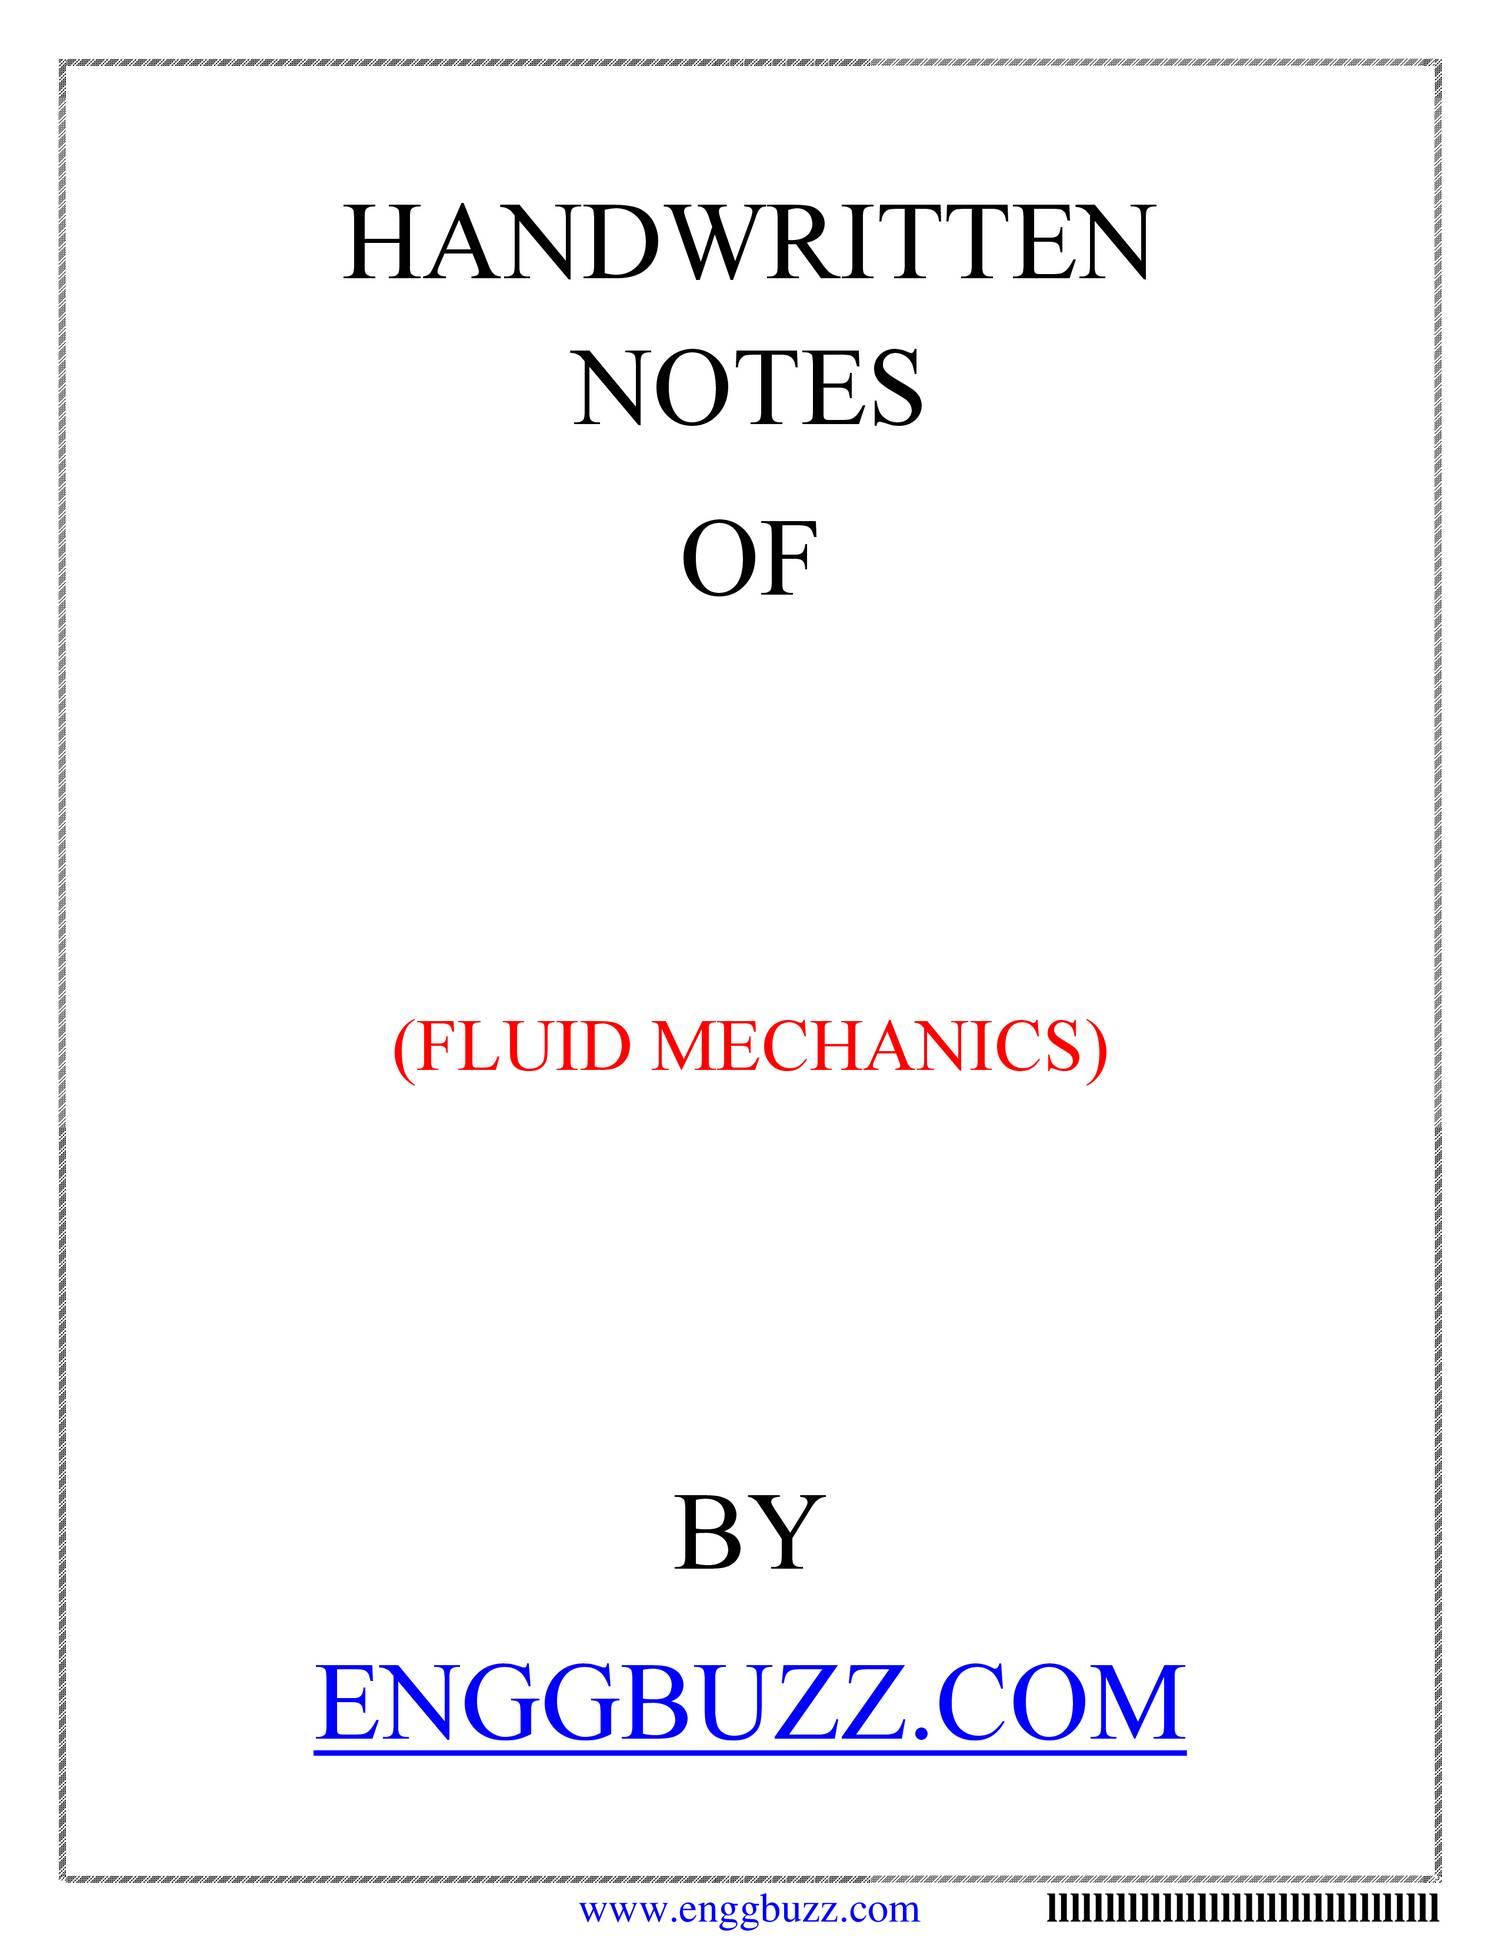 FLUID MECHANICS NOTES pdf   DocDroid